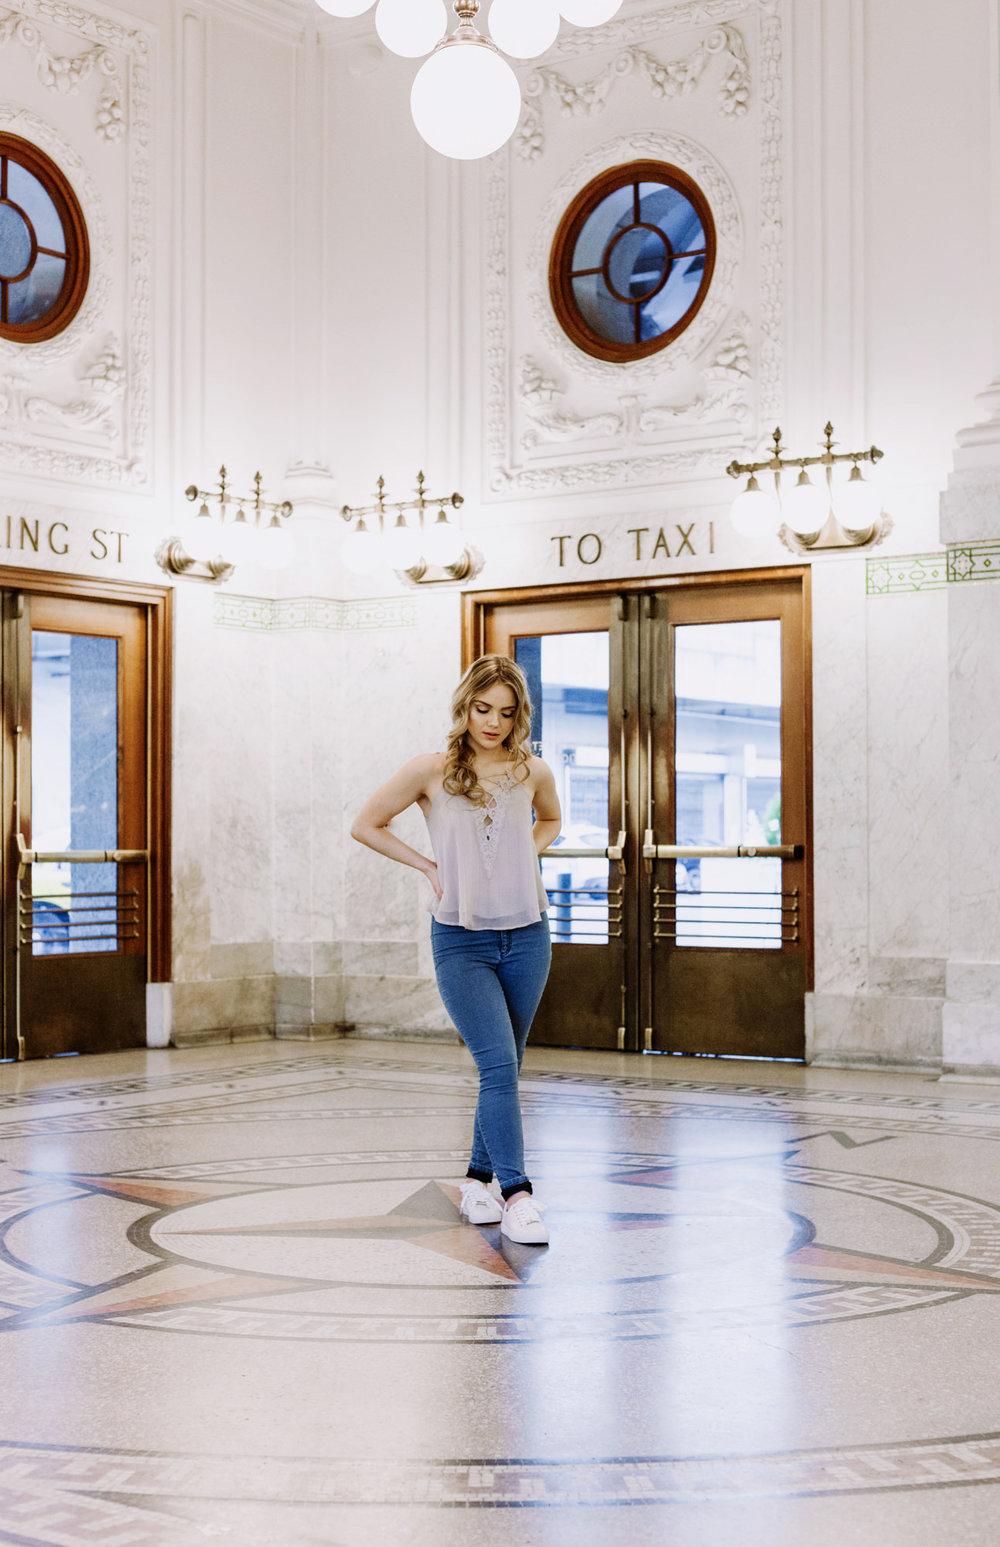 GabbySeniorPortraits-HaleyMcLainPhotography-13.JPG